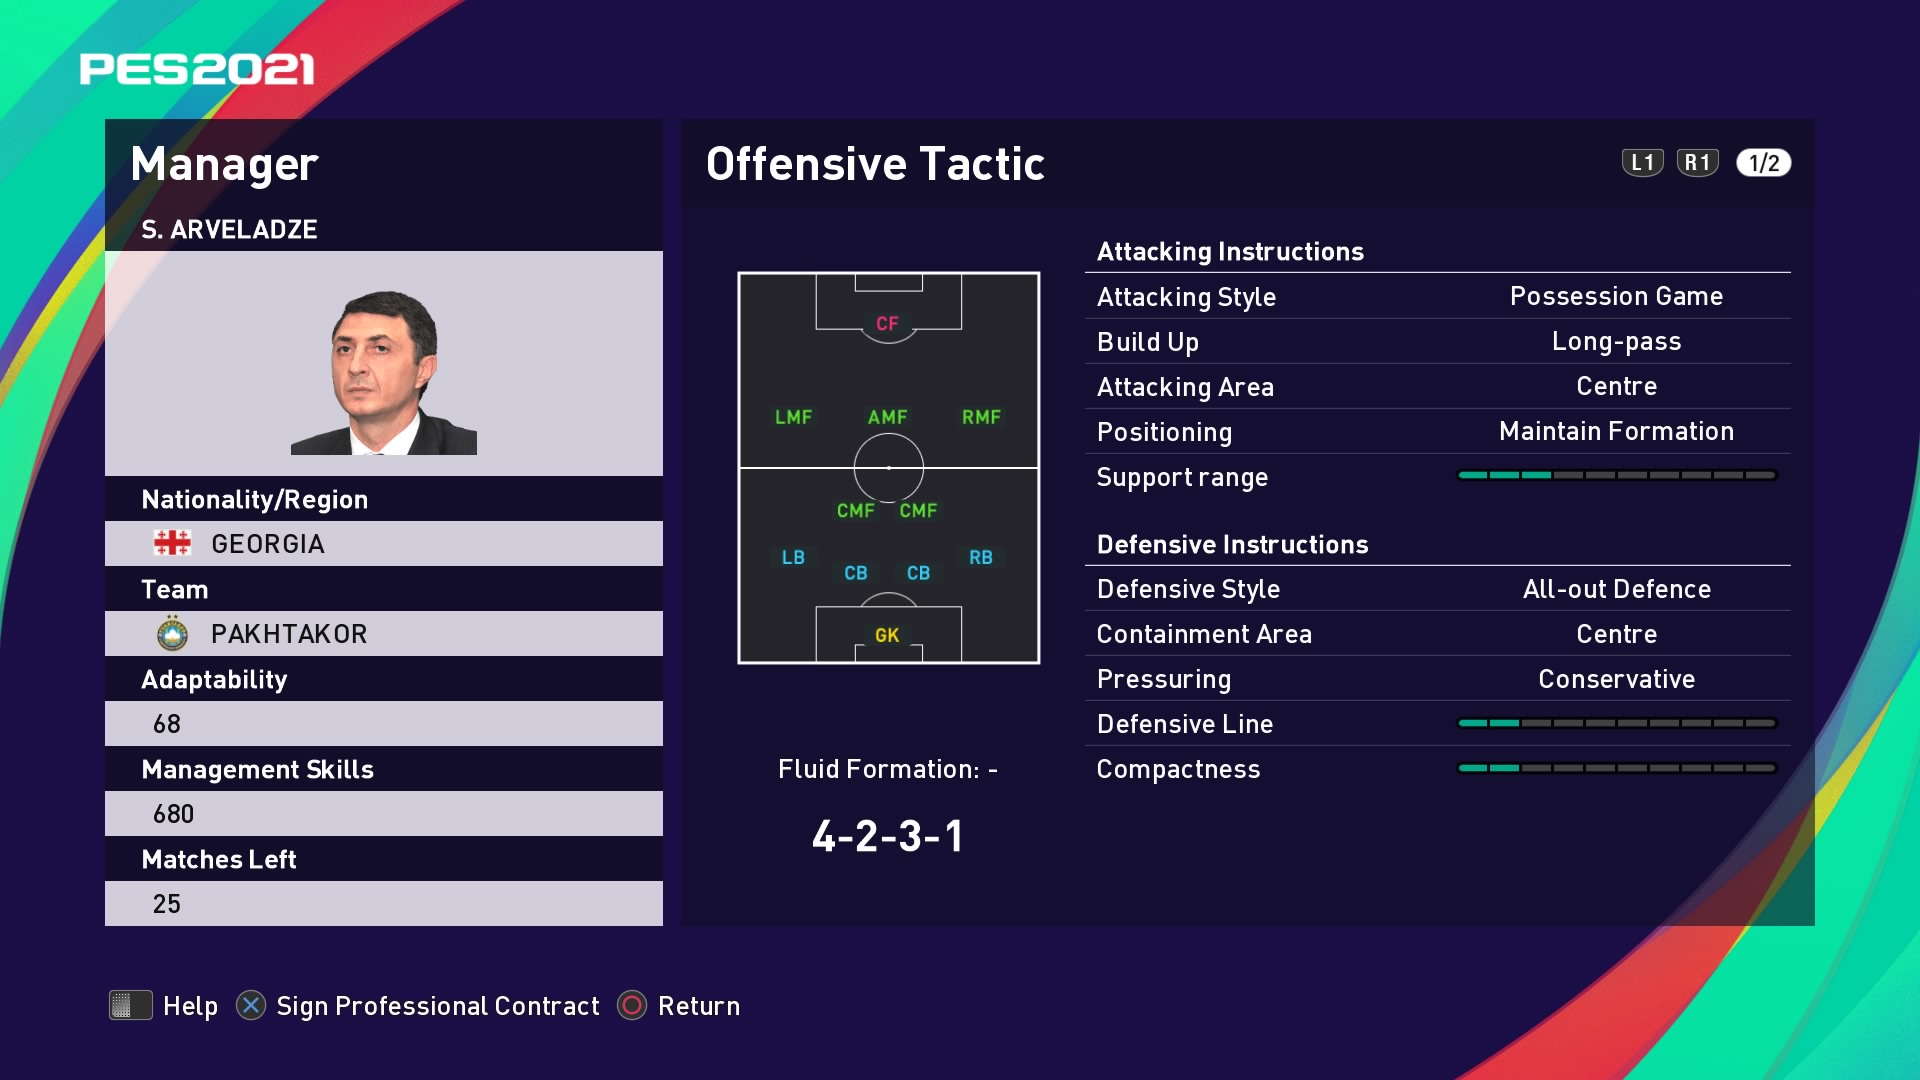 S. Arveladze (Shota Arveladze) Offensive Tactic in PES 2021 myClub